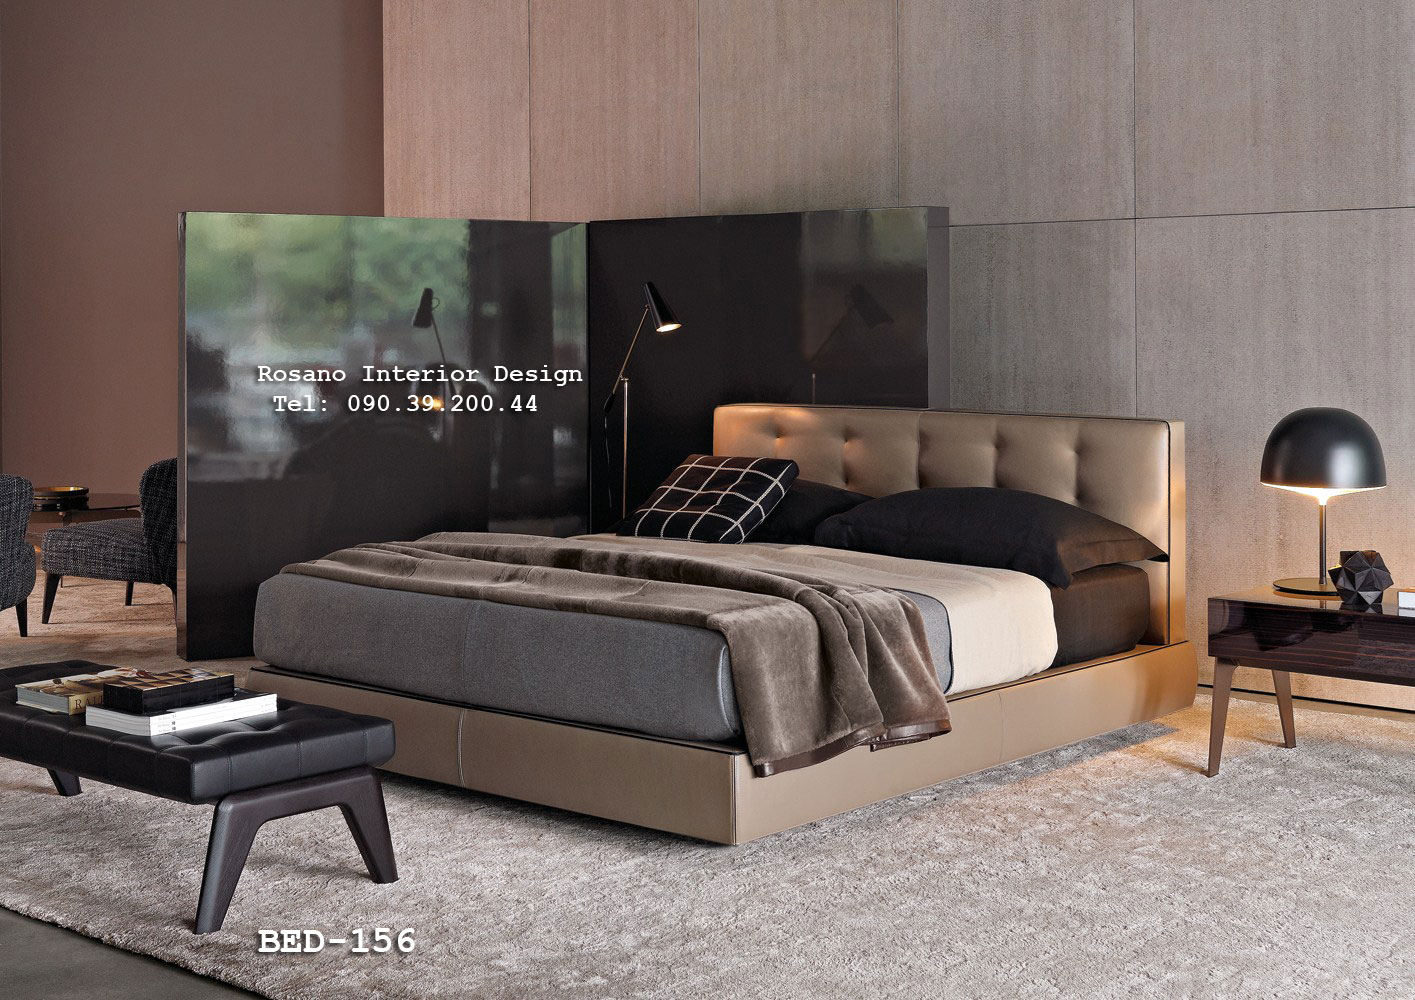 Giường ngủ Rosano